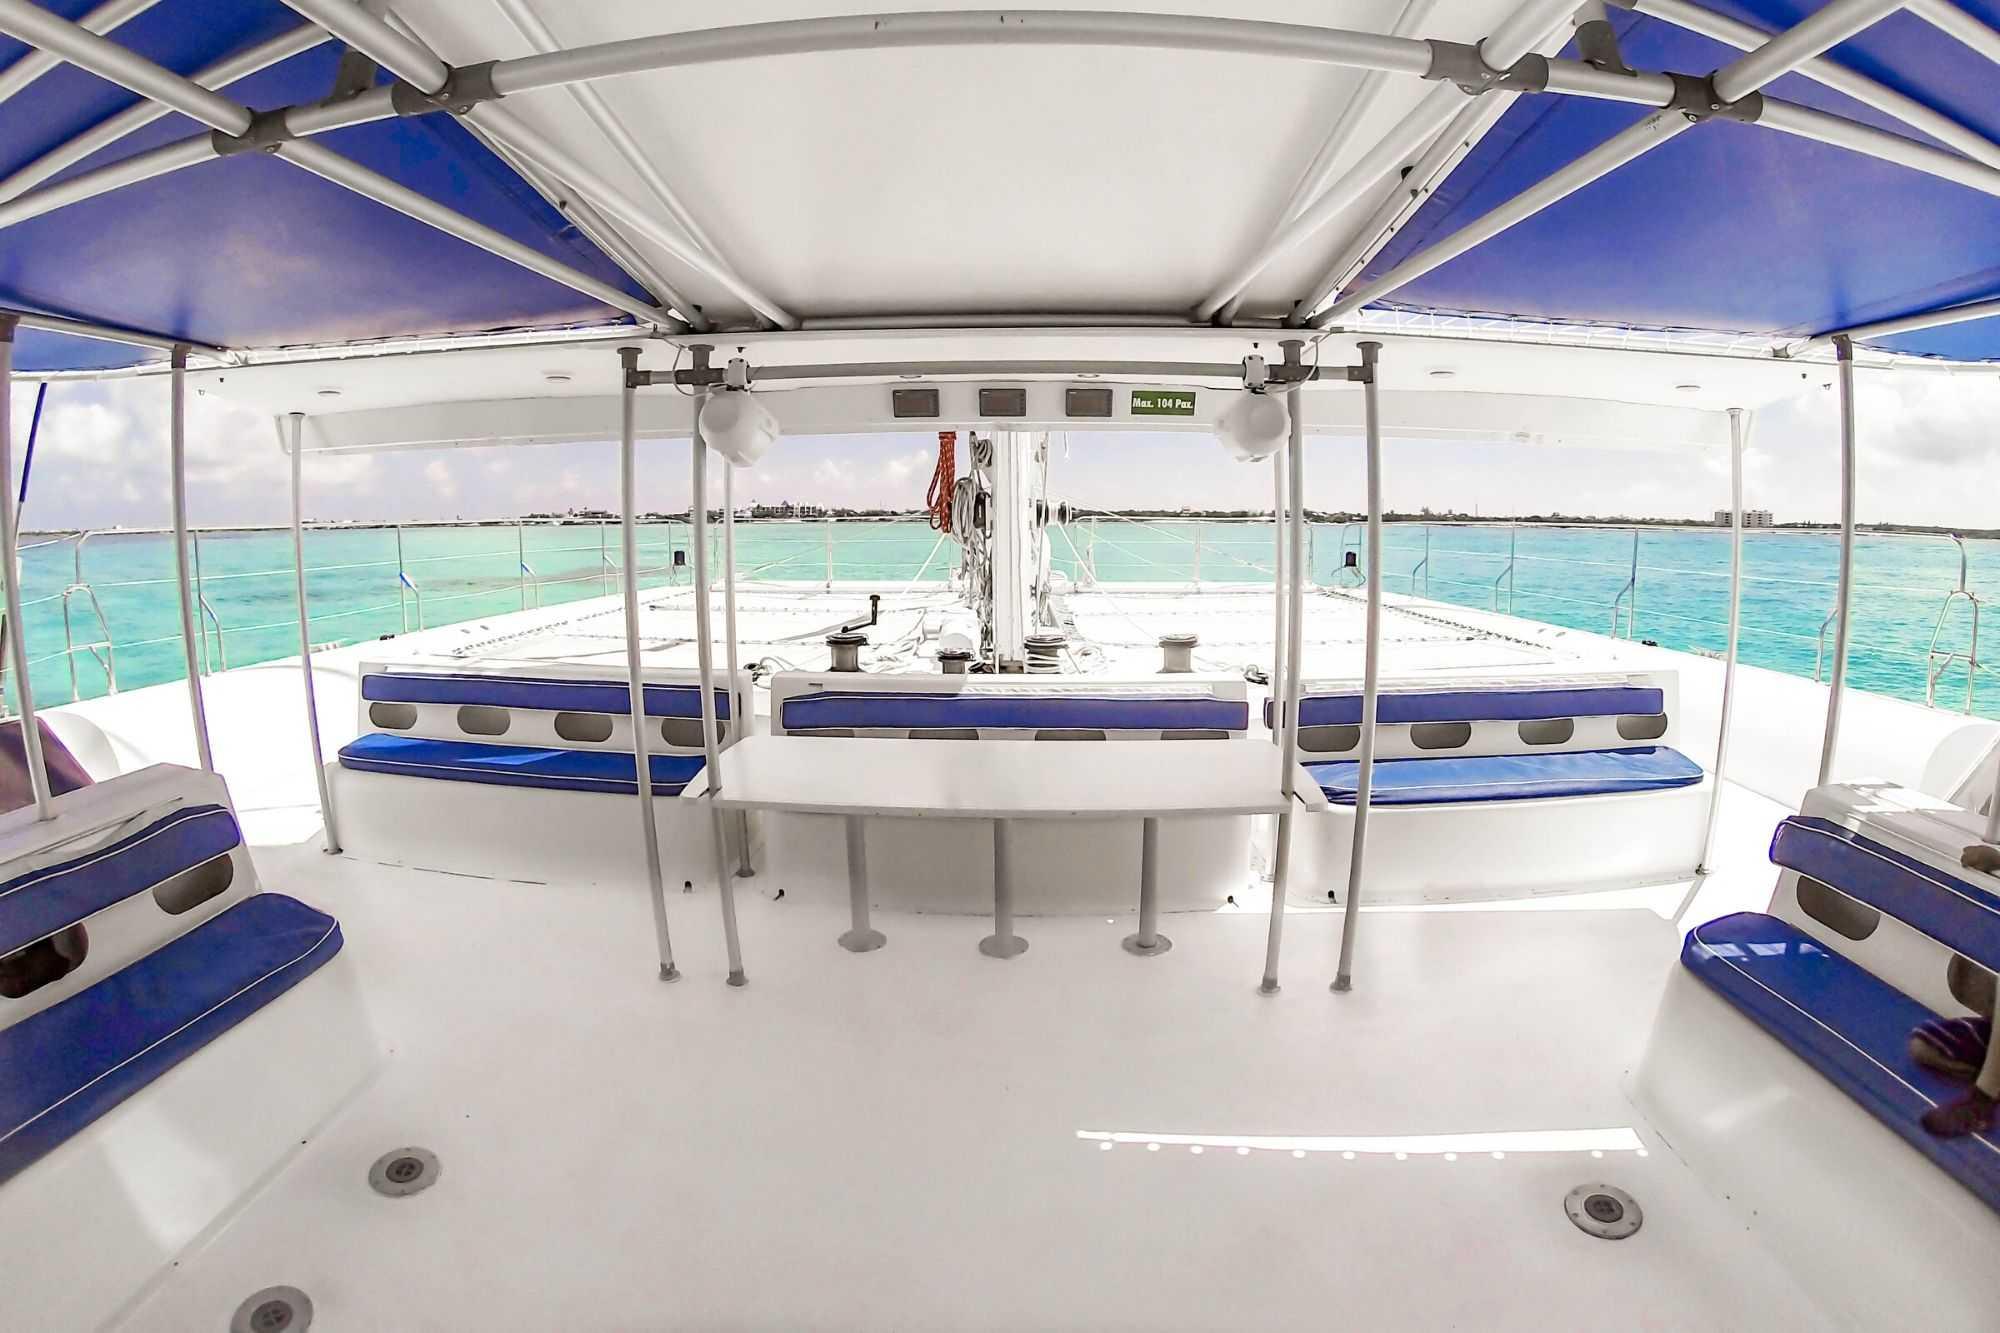 10 Private Isla Mujeres tour in catamaran - Sea Passion I II - Cancun Sailing